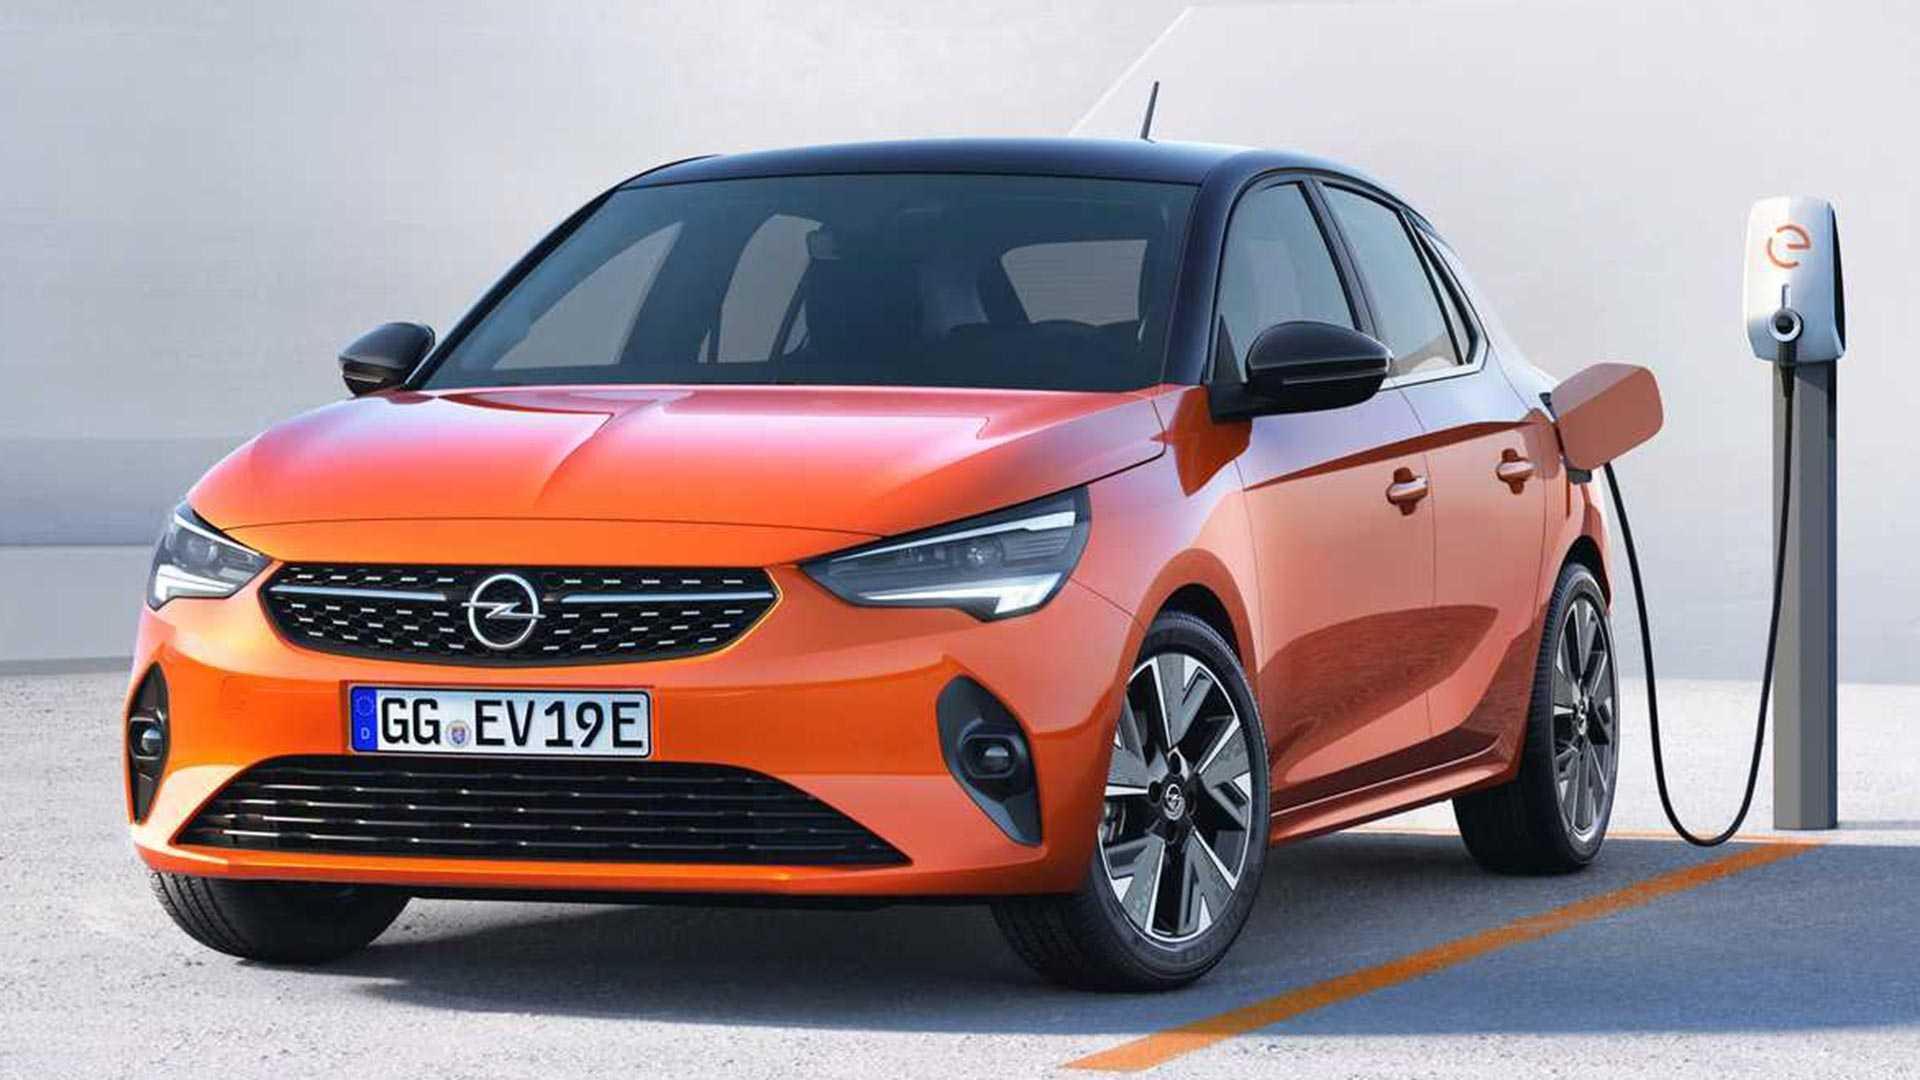 Kako će se Opel otarasiti zastarelih platformi i ostvariti strože ekološke standarde